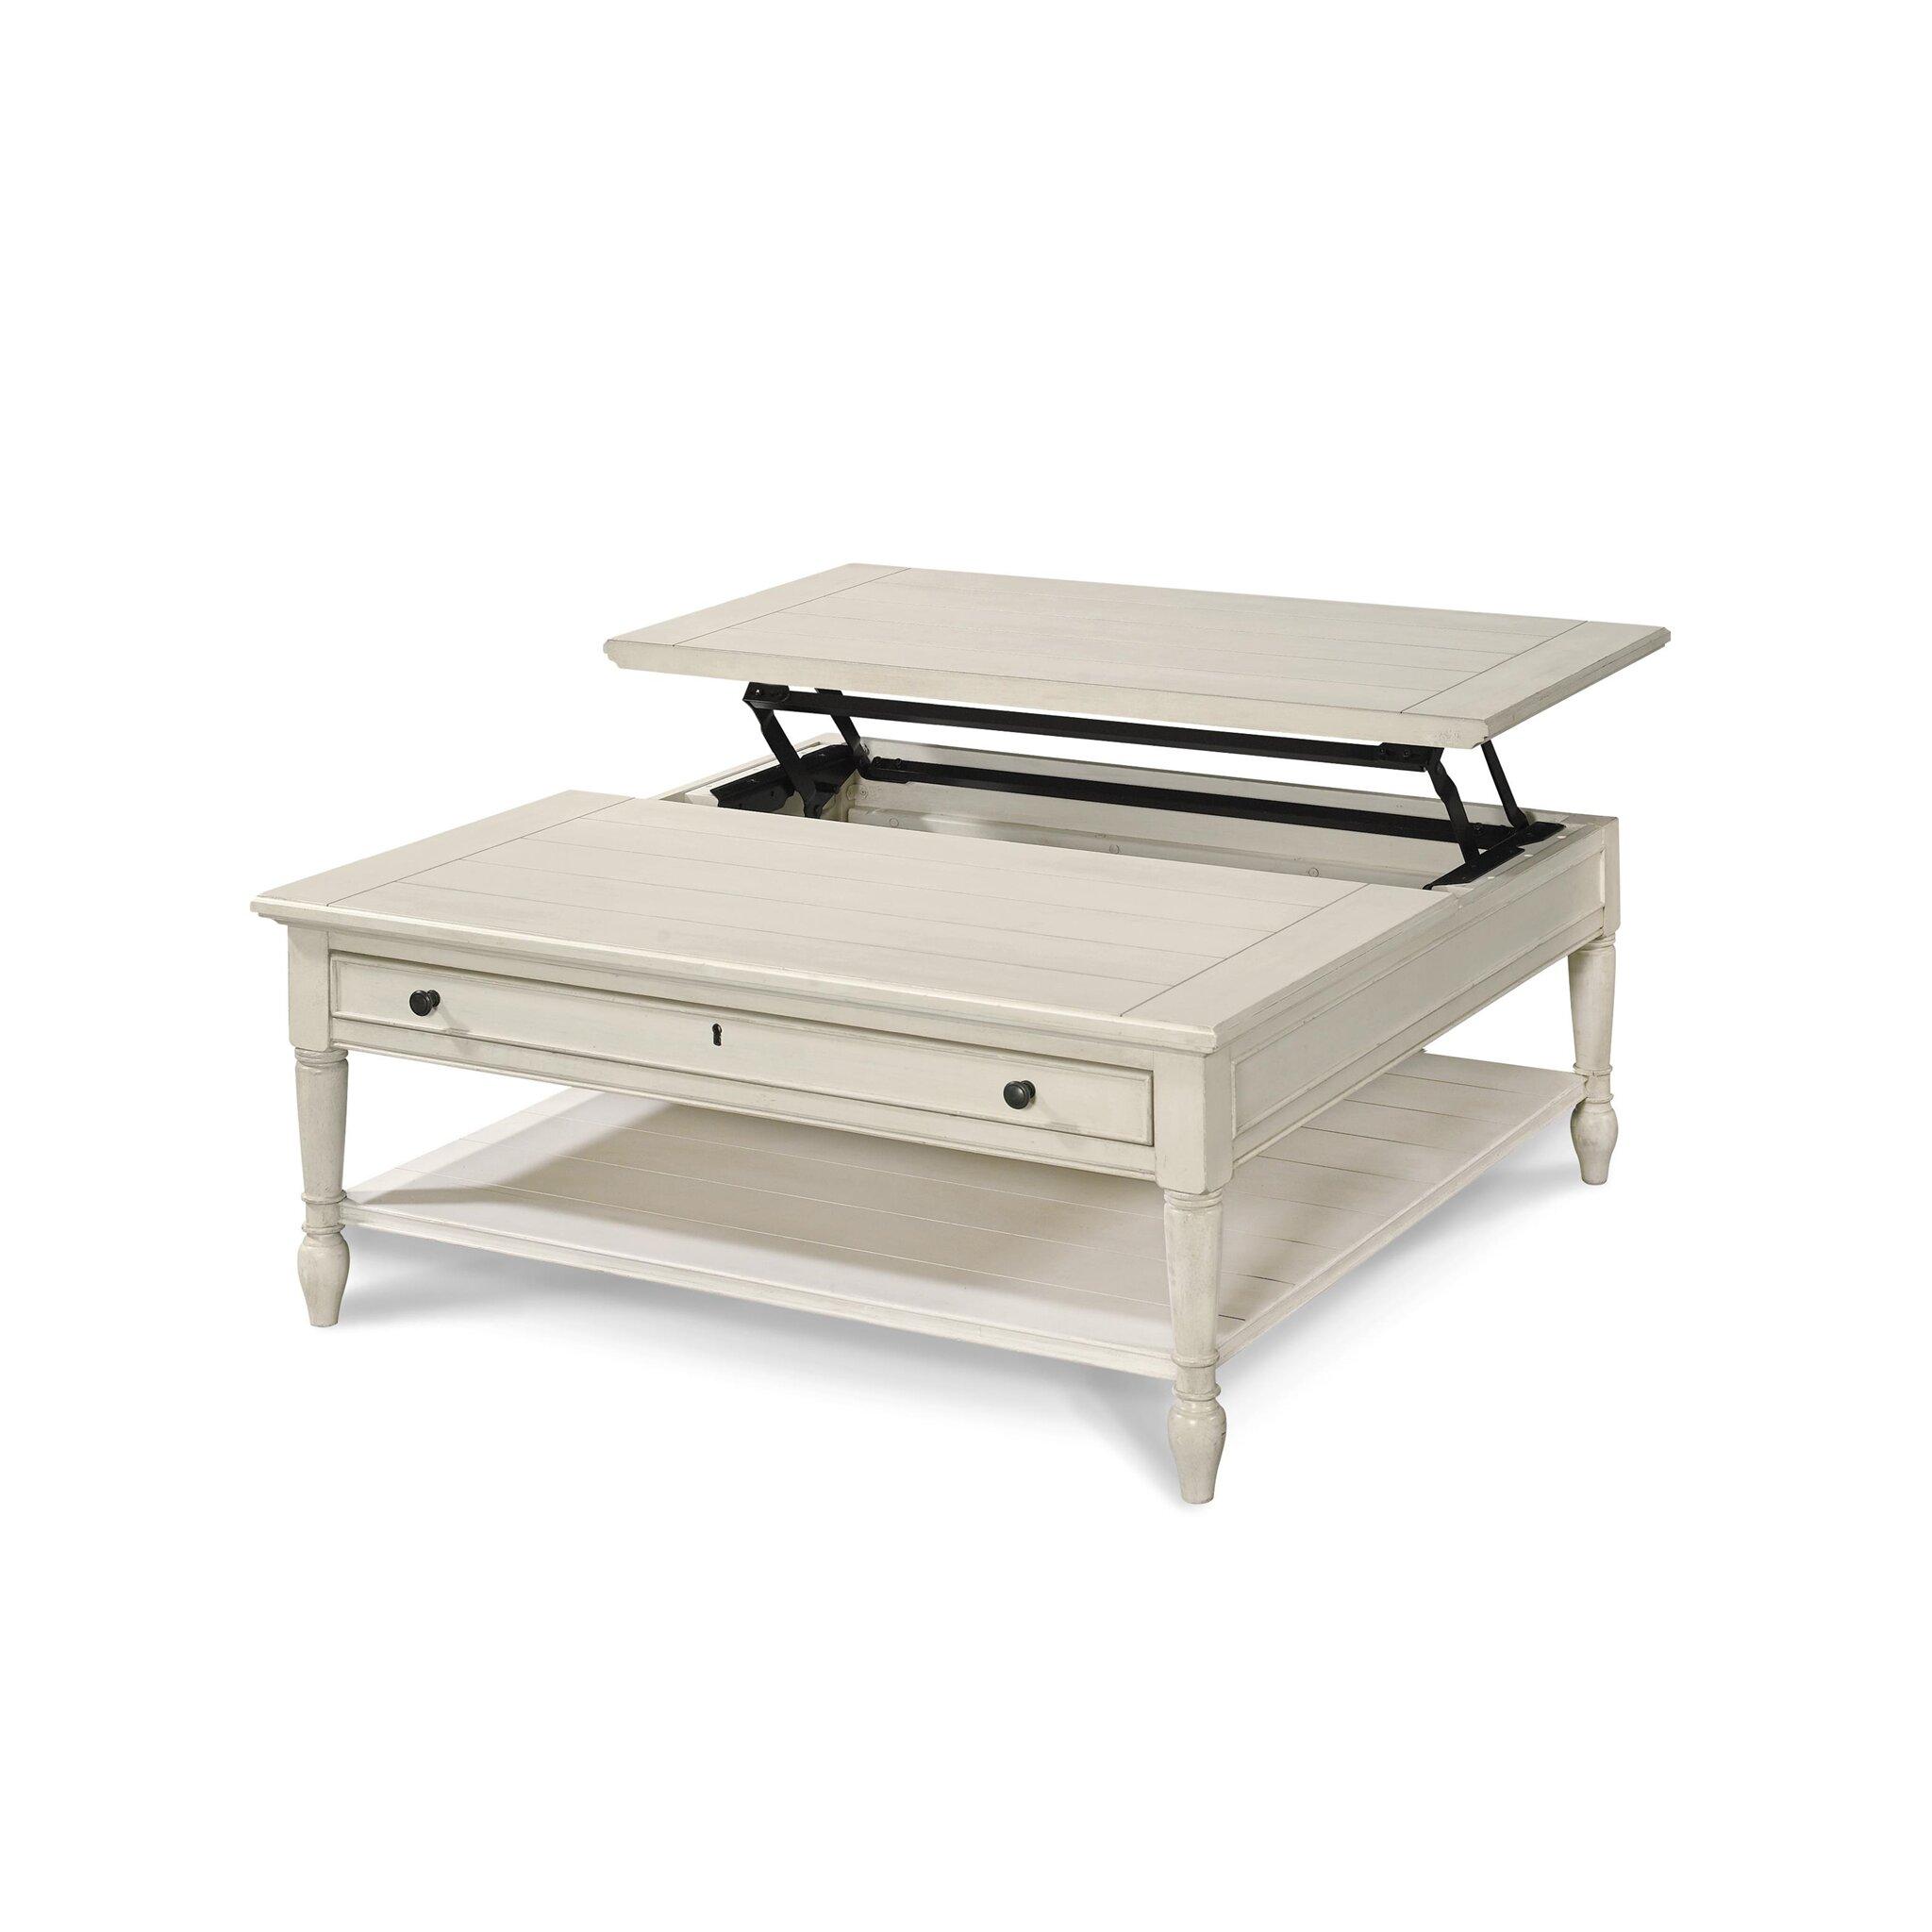 Next Day Delivery Bedroom Furniture Bedroom Furniture Next Day Delivery Bedroom Furniture Element174ru